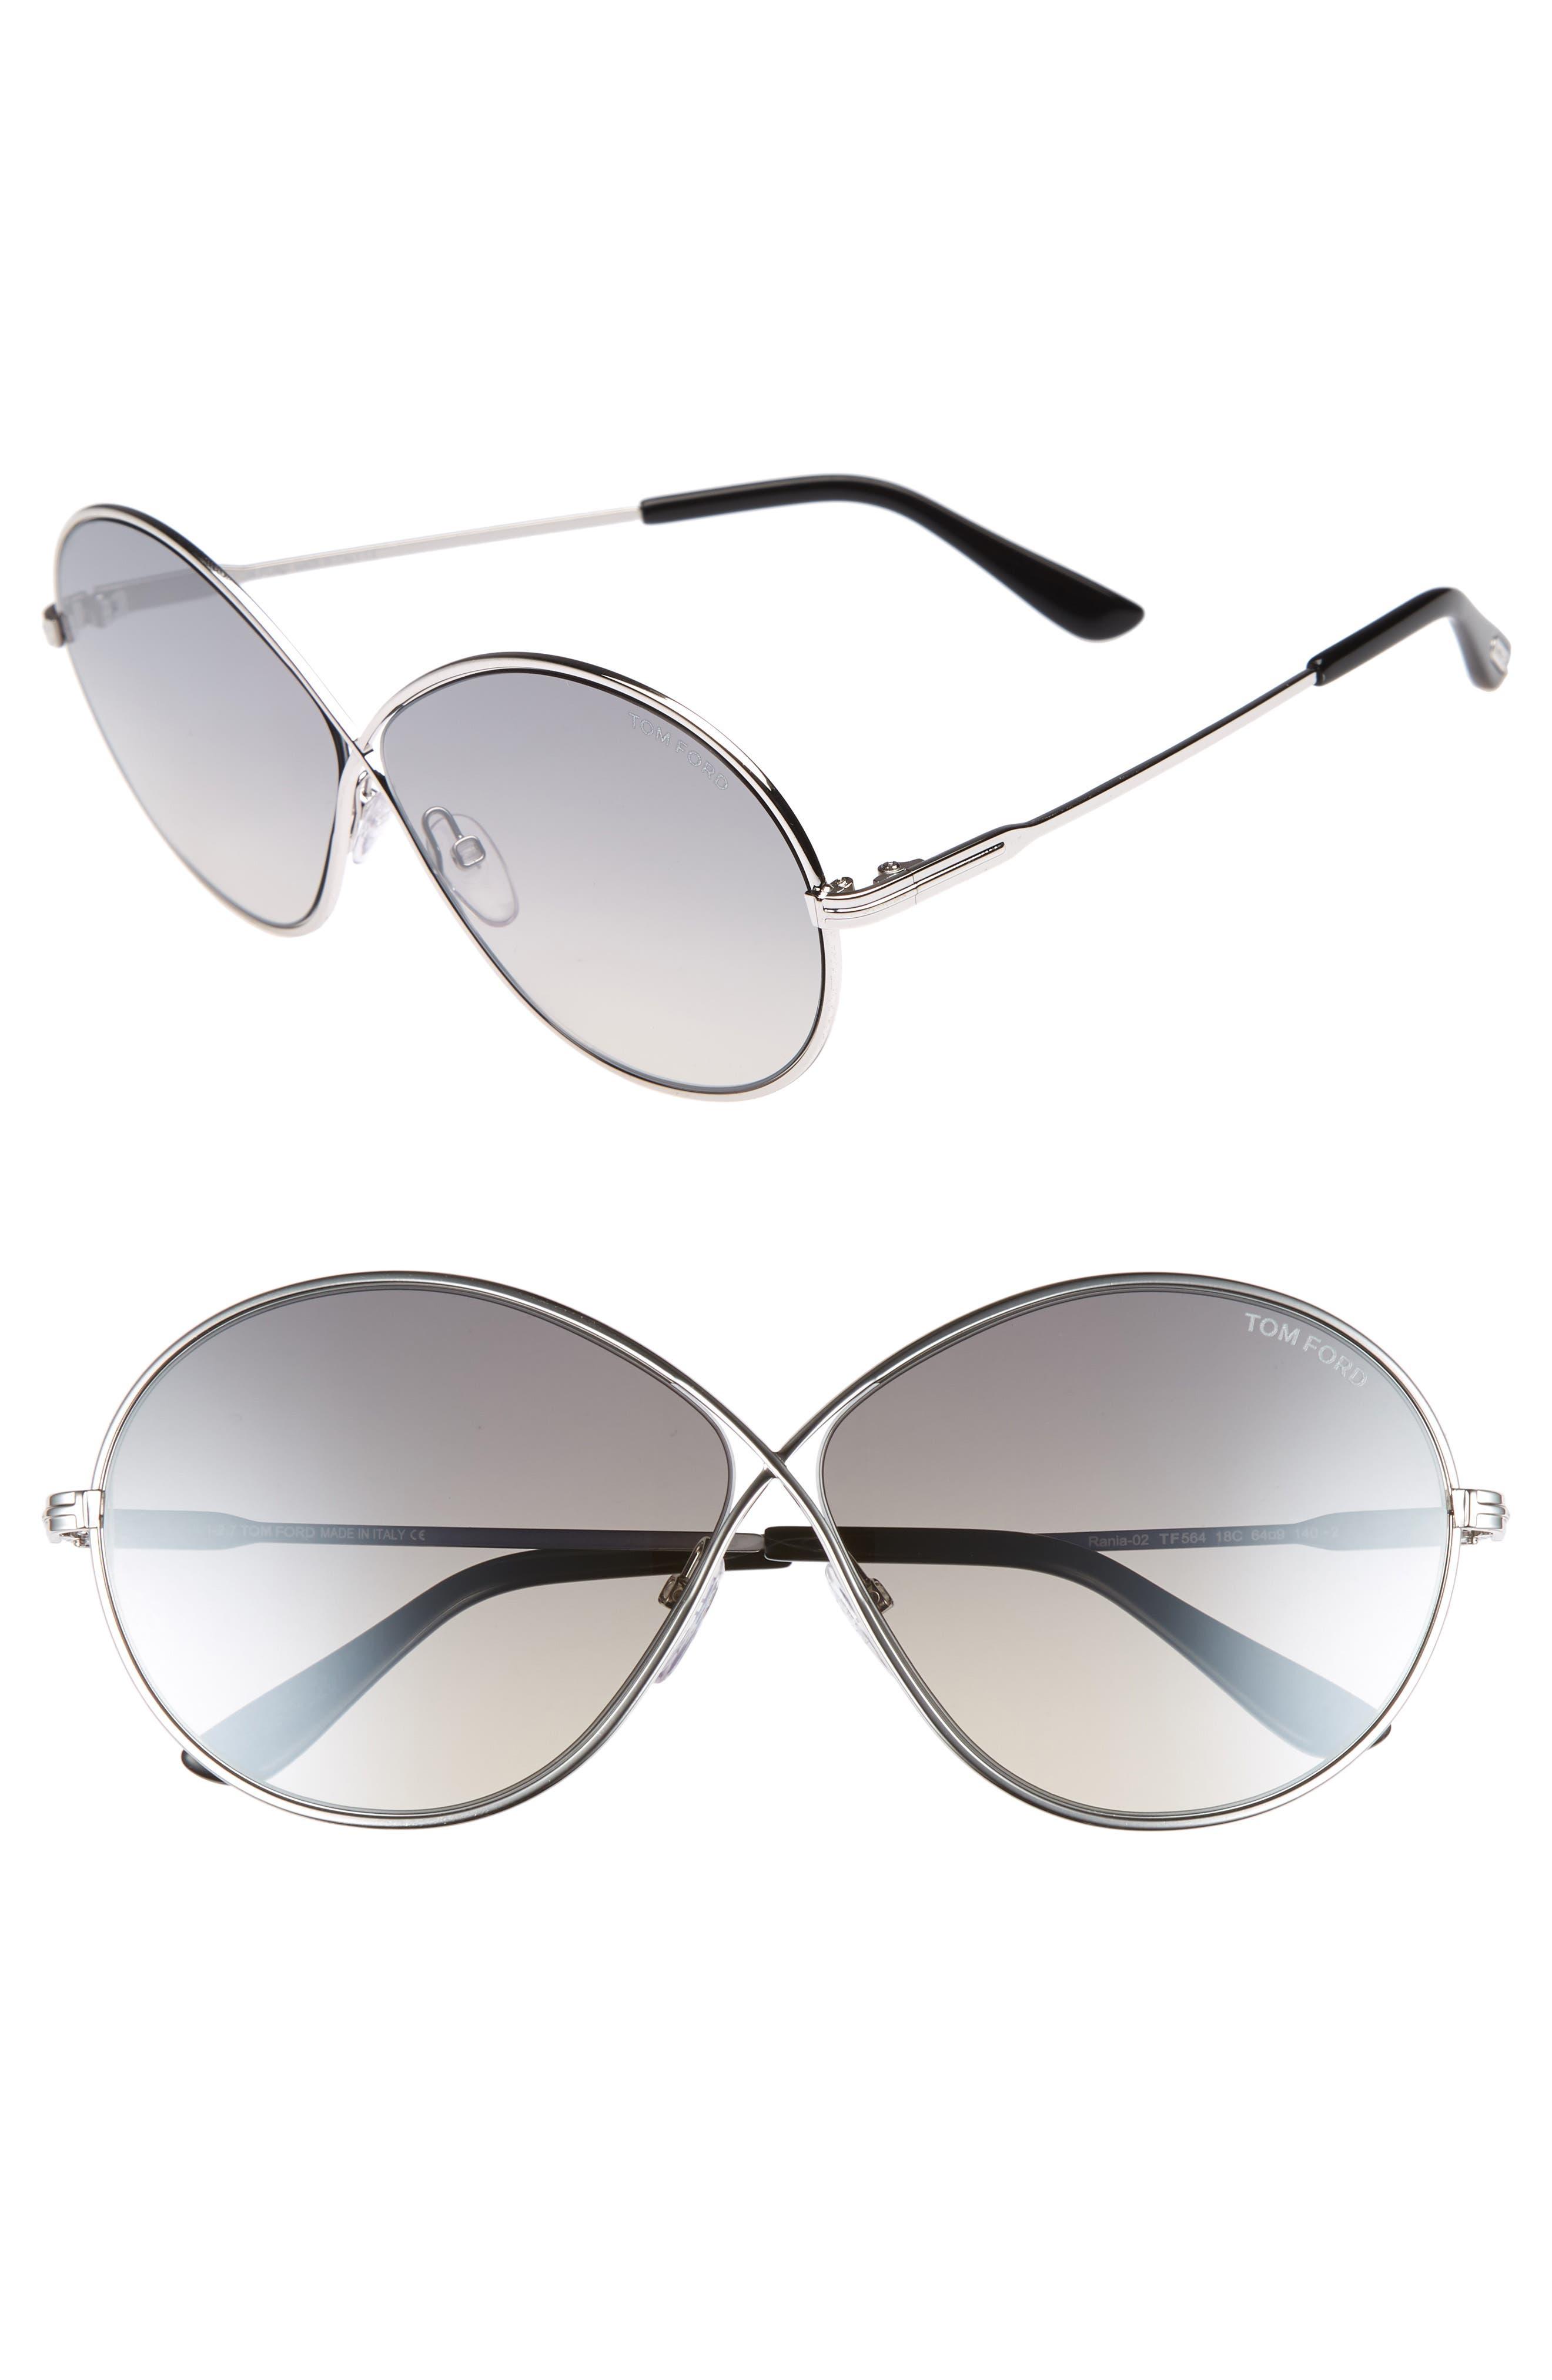 Rania 64mm Oversize Round Sunglasses,                             Main thumbnail 1, color,                             040